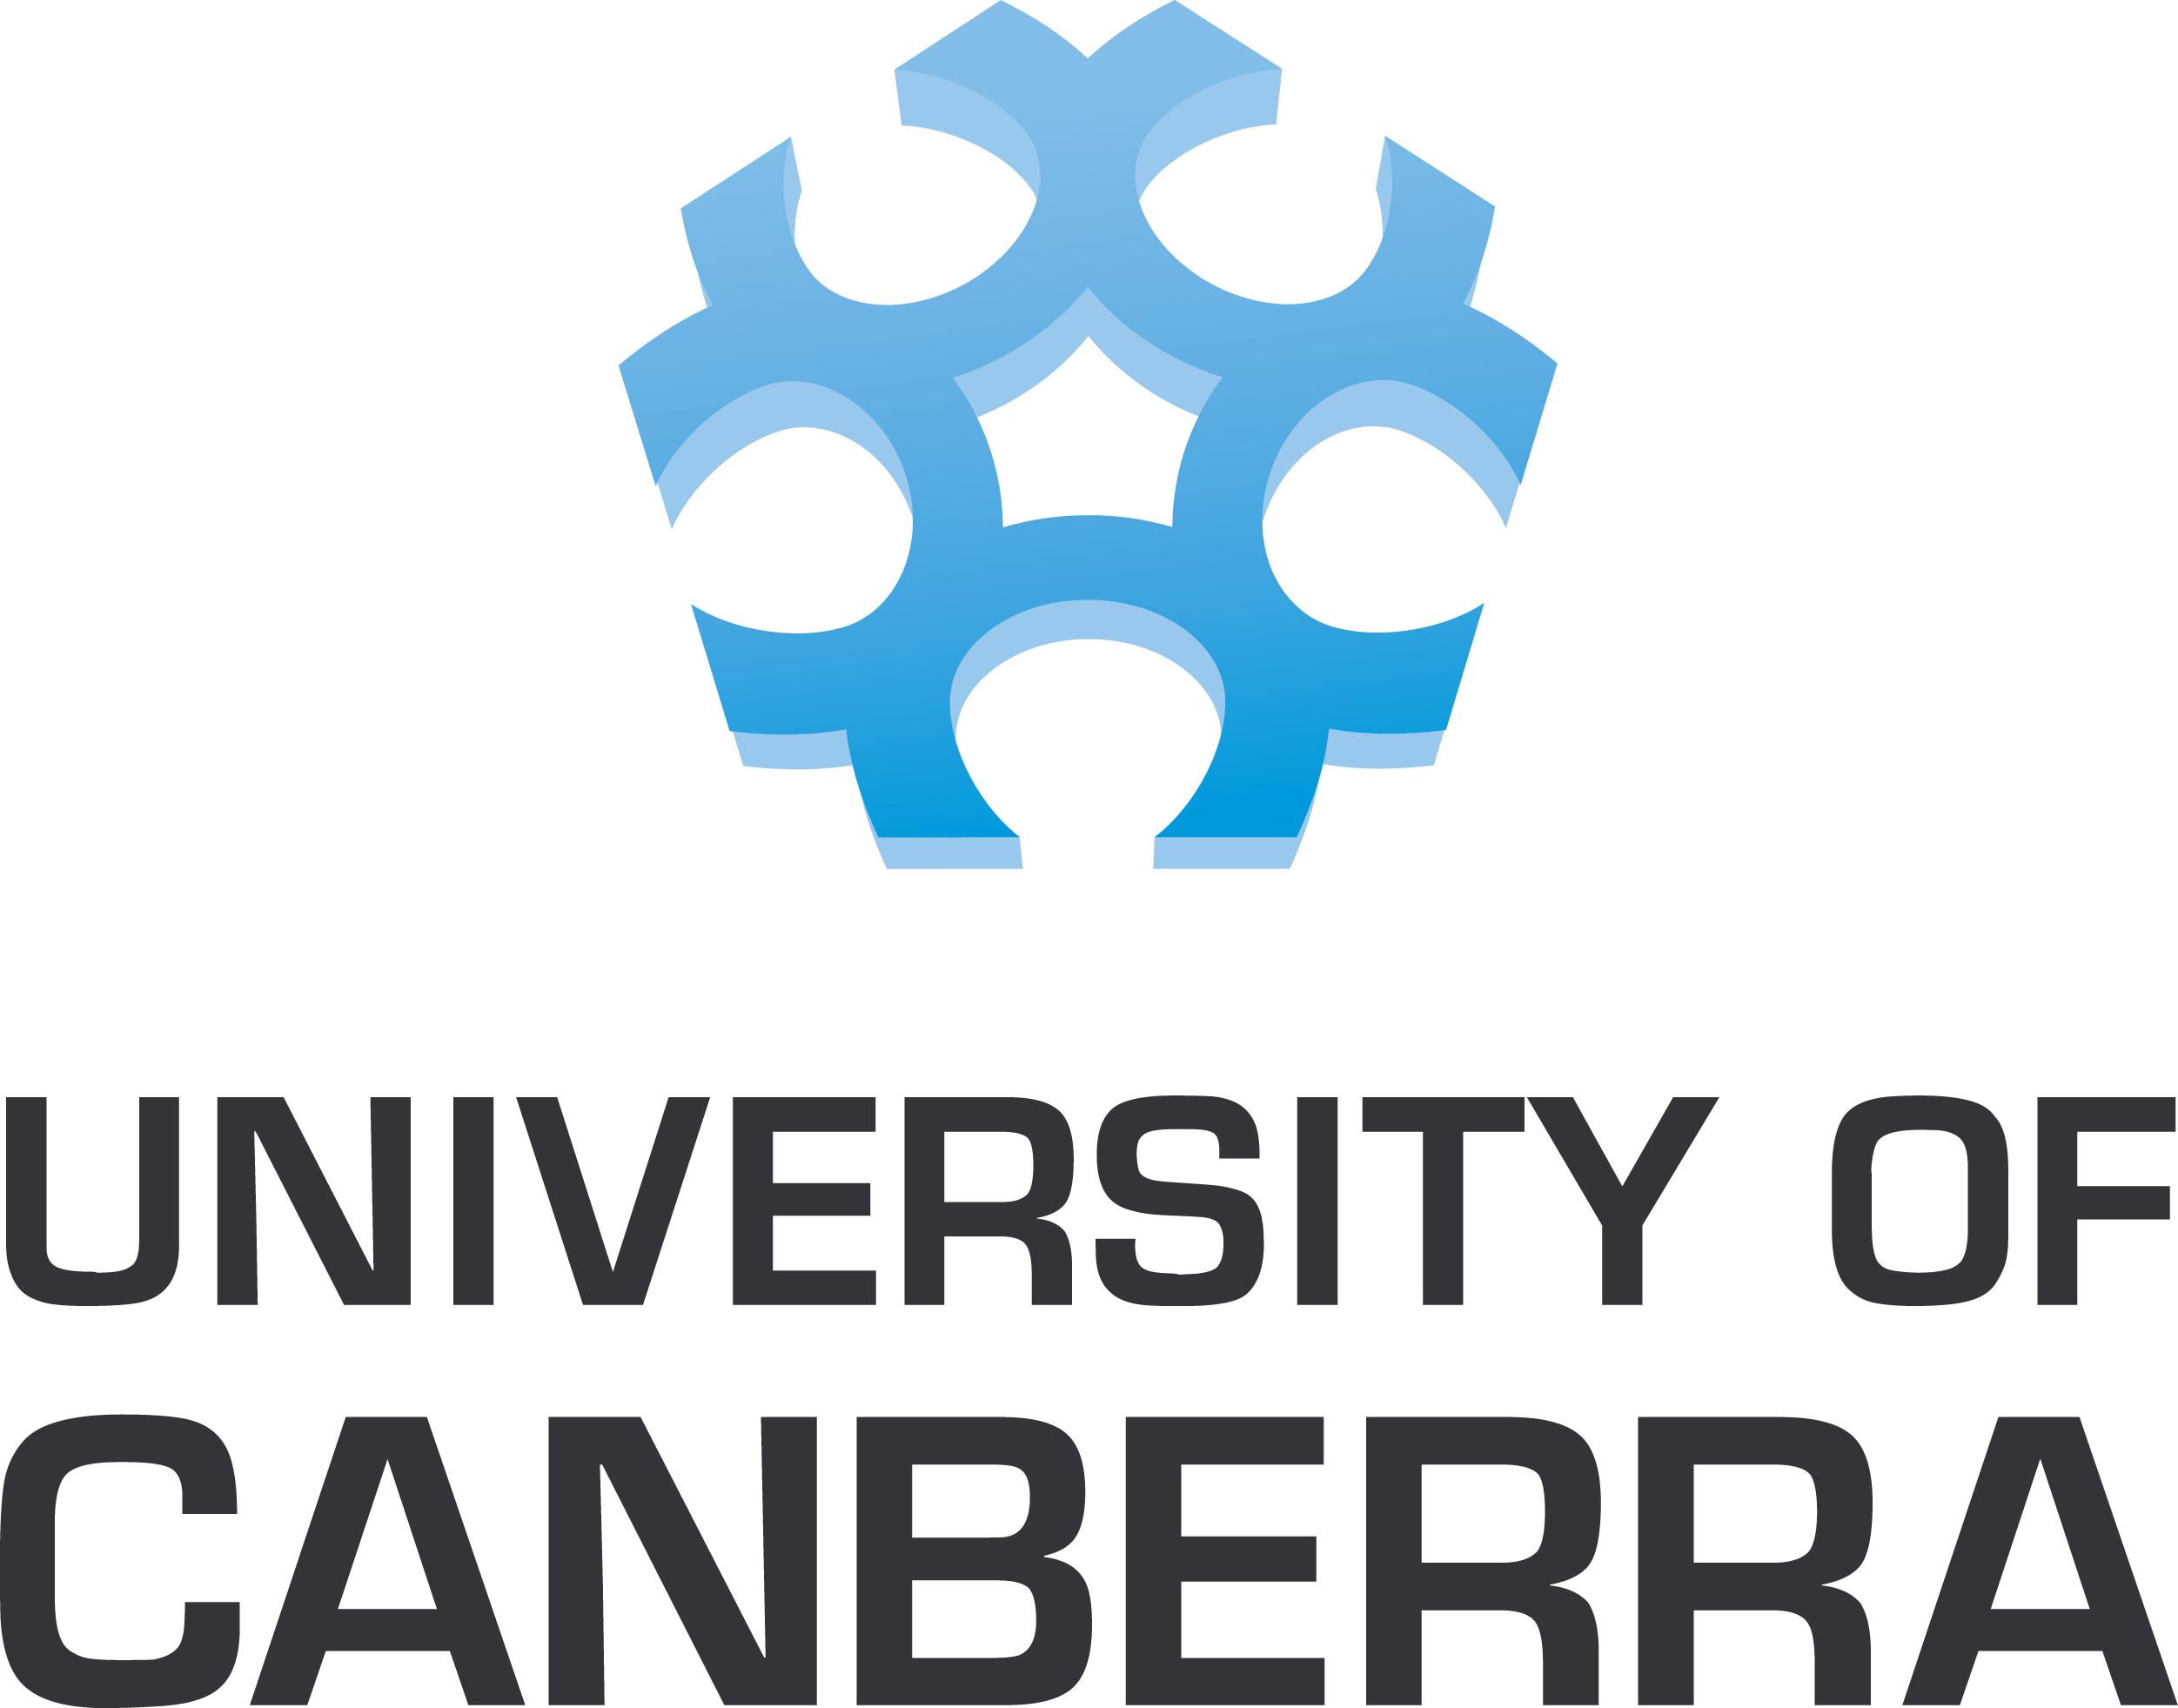 Math university of law sydney